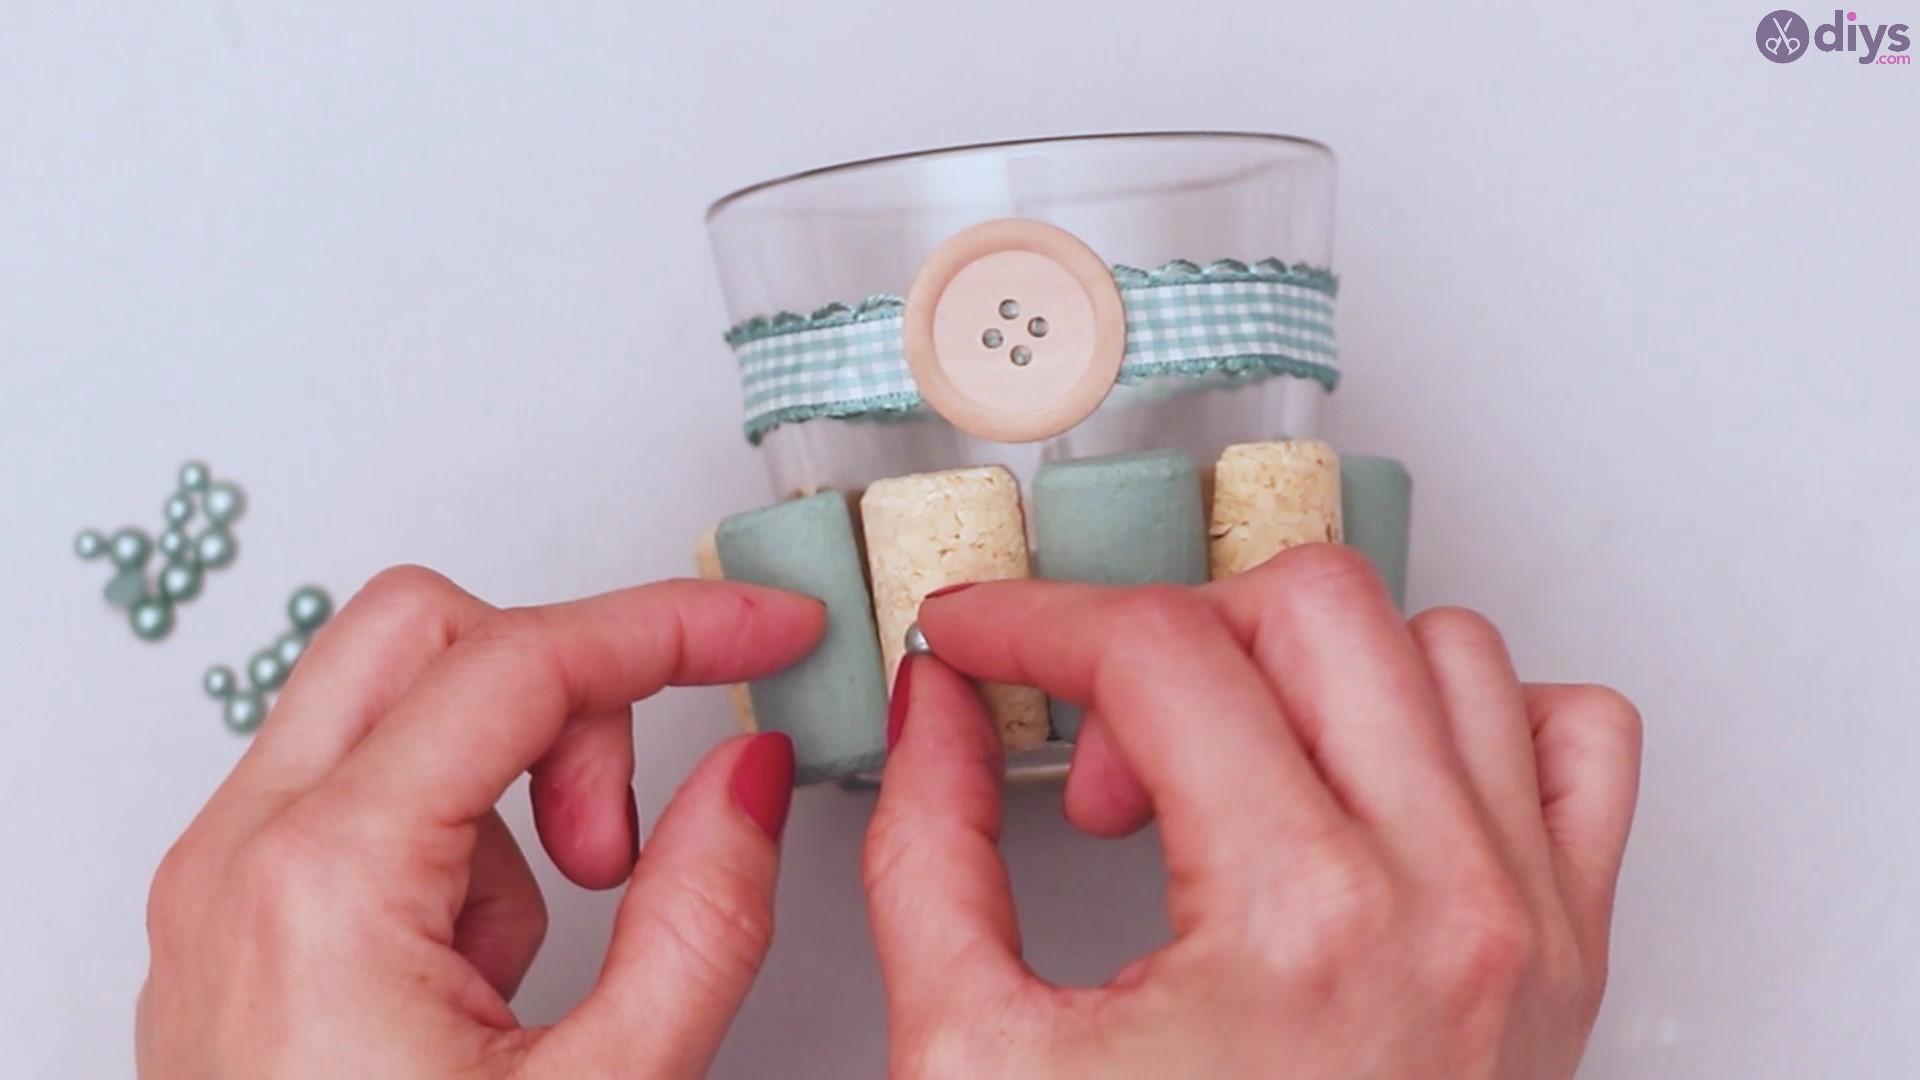 Diy wine cork candle holder (27)